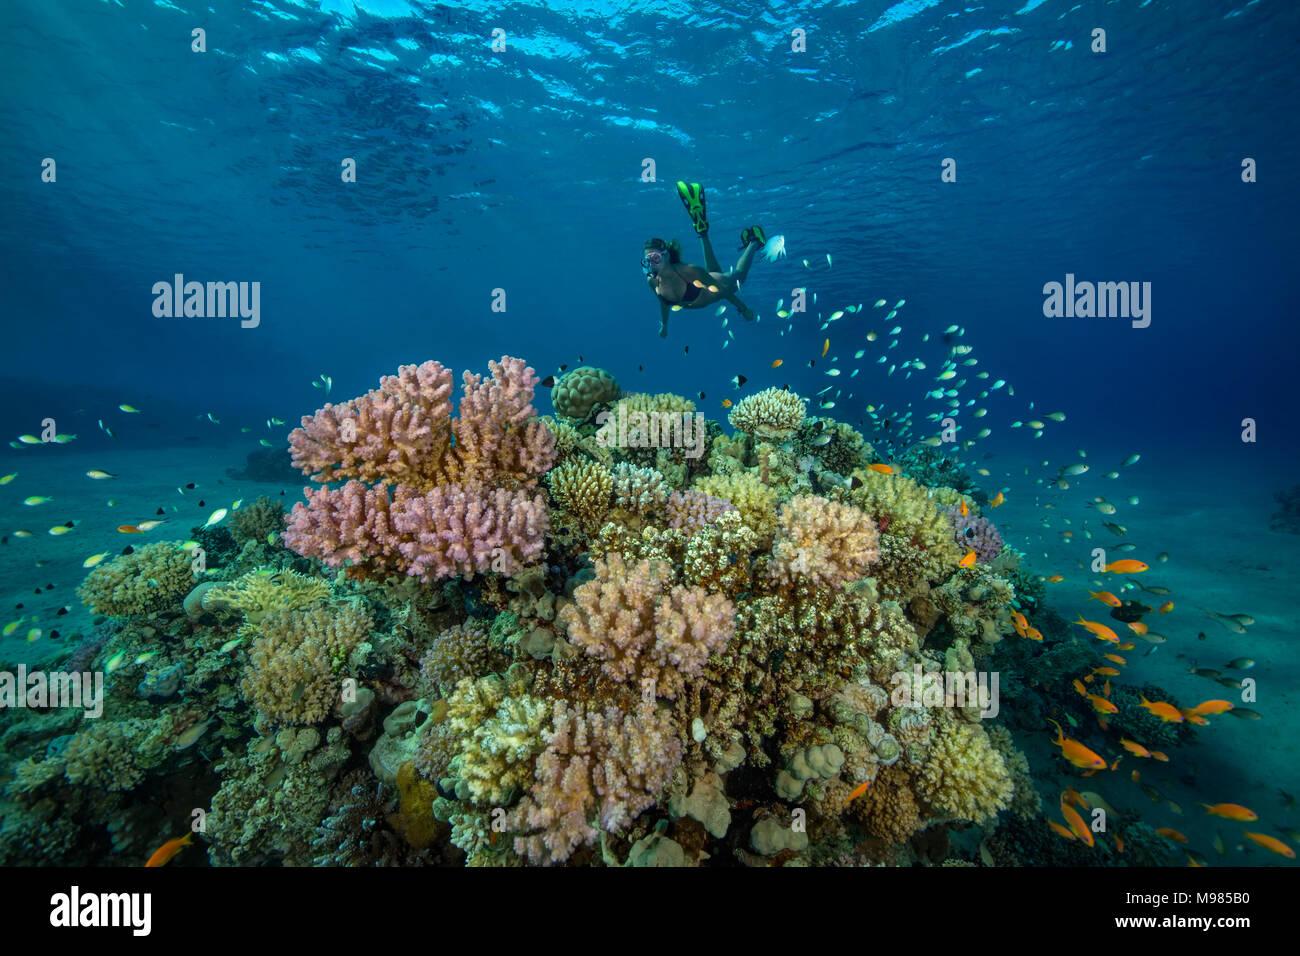 Egypt, Red Sea, Hurghada, teenage girl snorkeling at coral reef - Stock Image